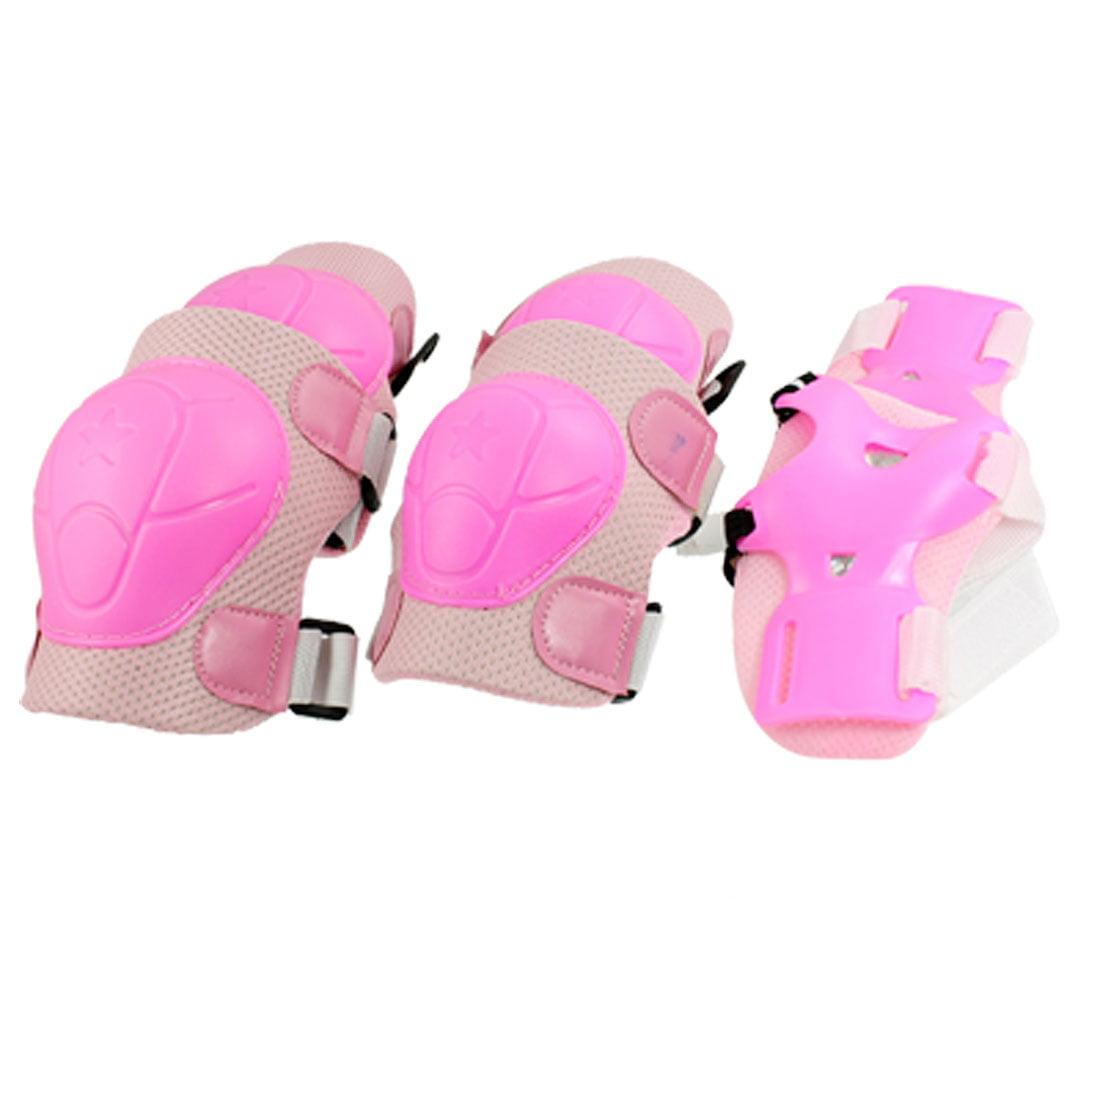 Unique Bargains Skateboard Skating Safety Gear Set Wrist Guard Elbow Pads Knee Pads for Girls Kids by Unique-Bargains